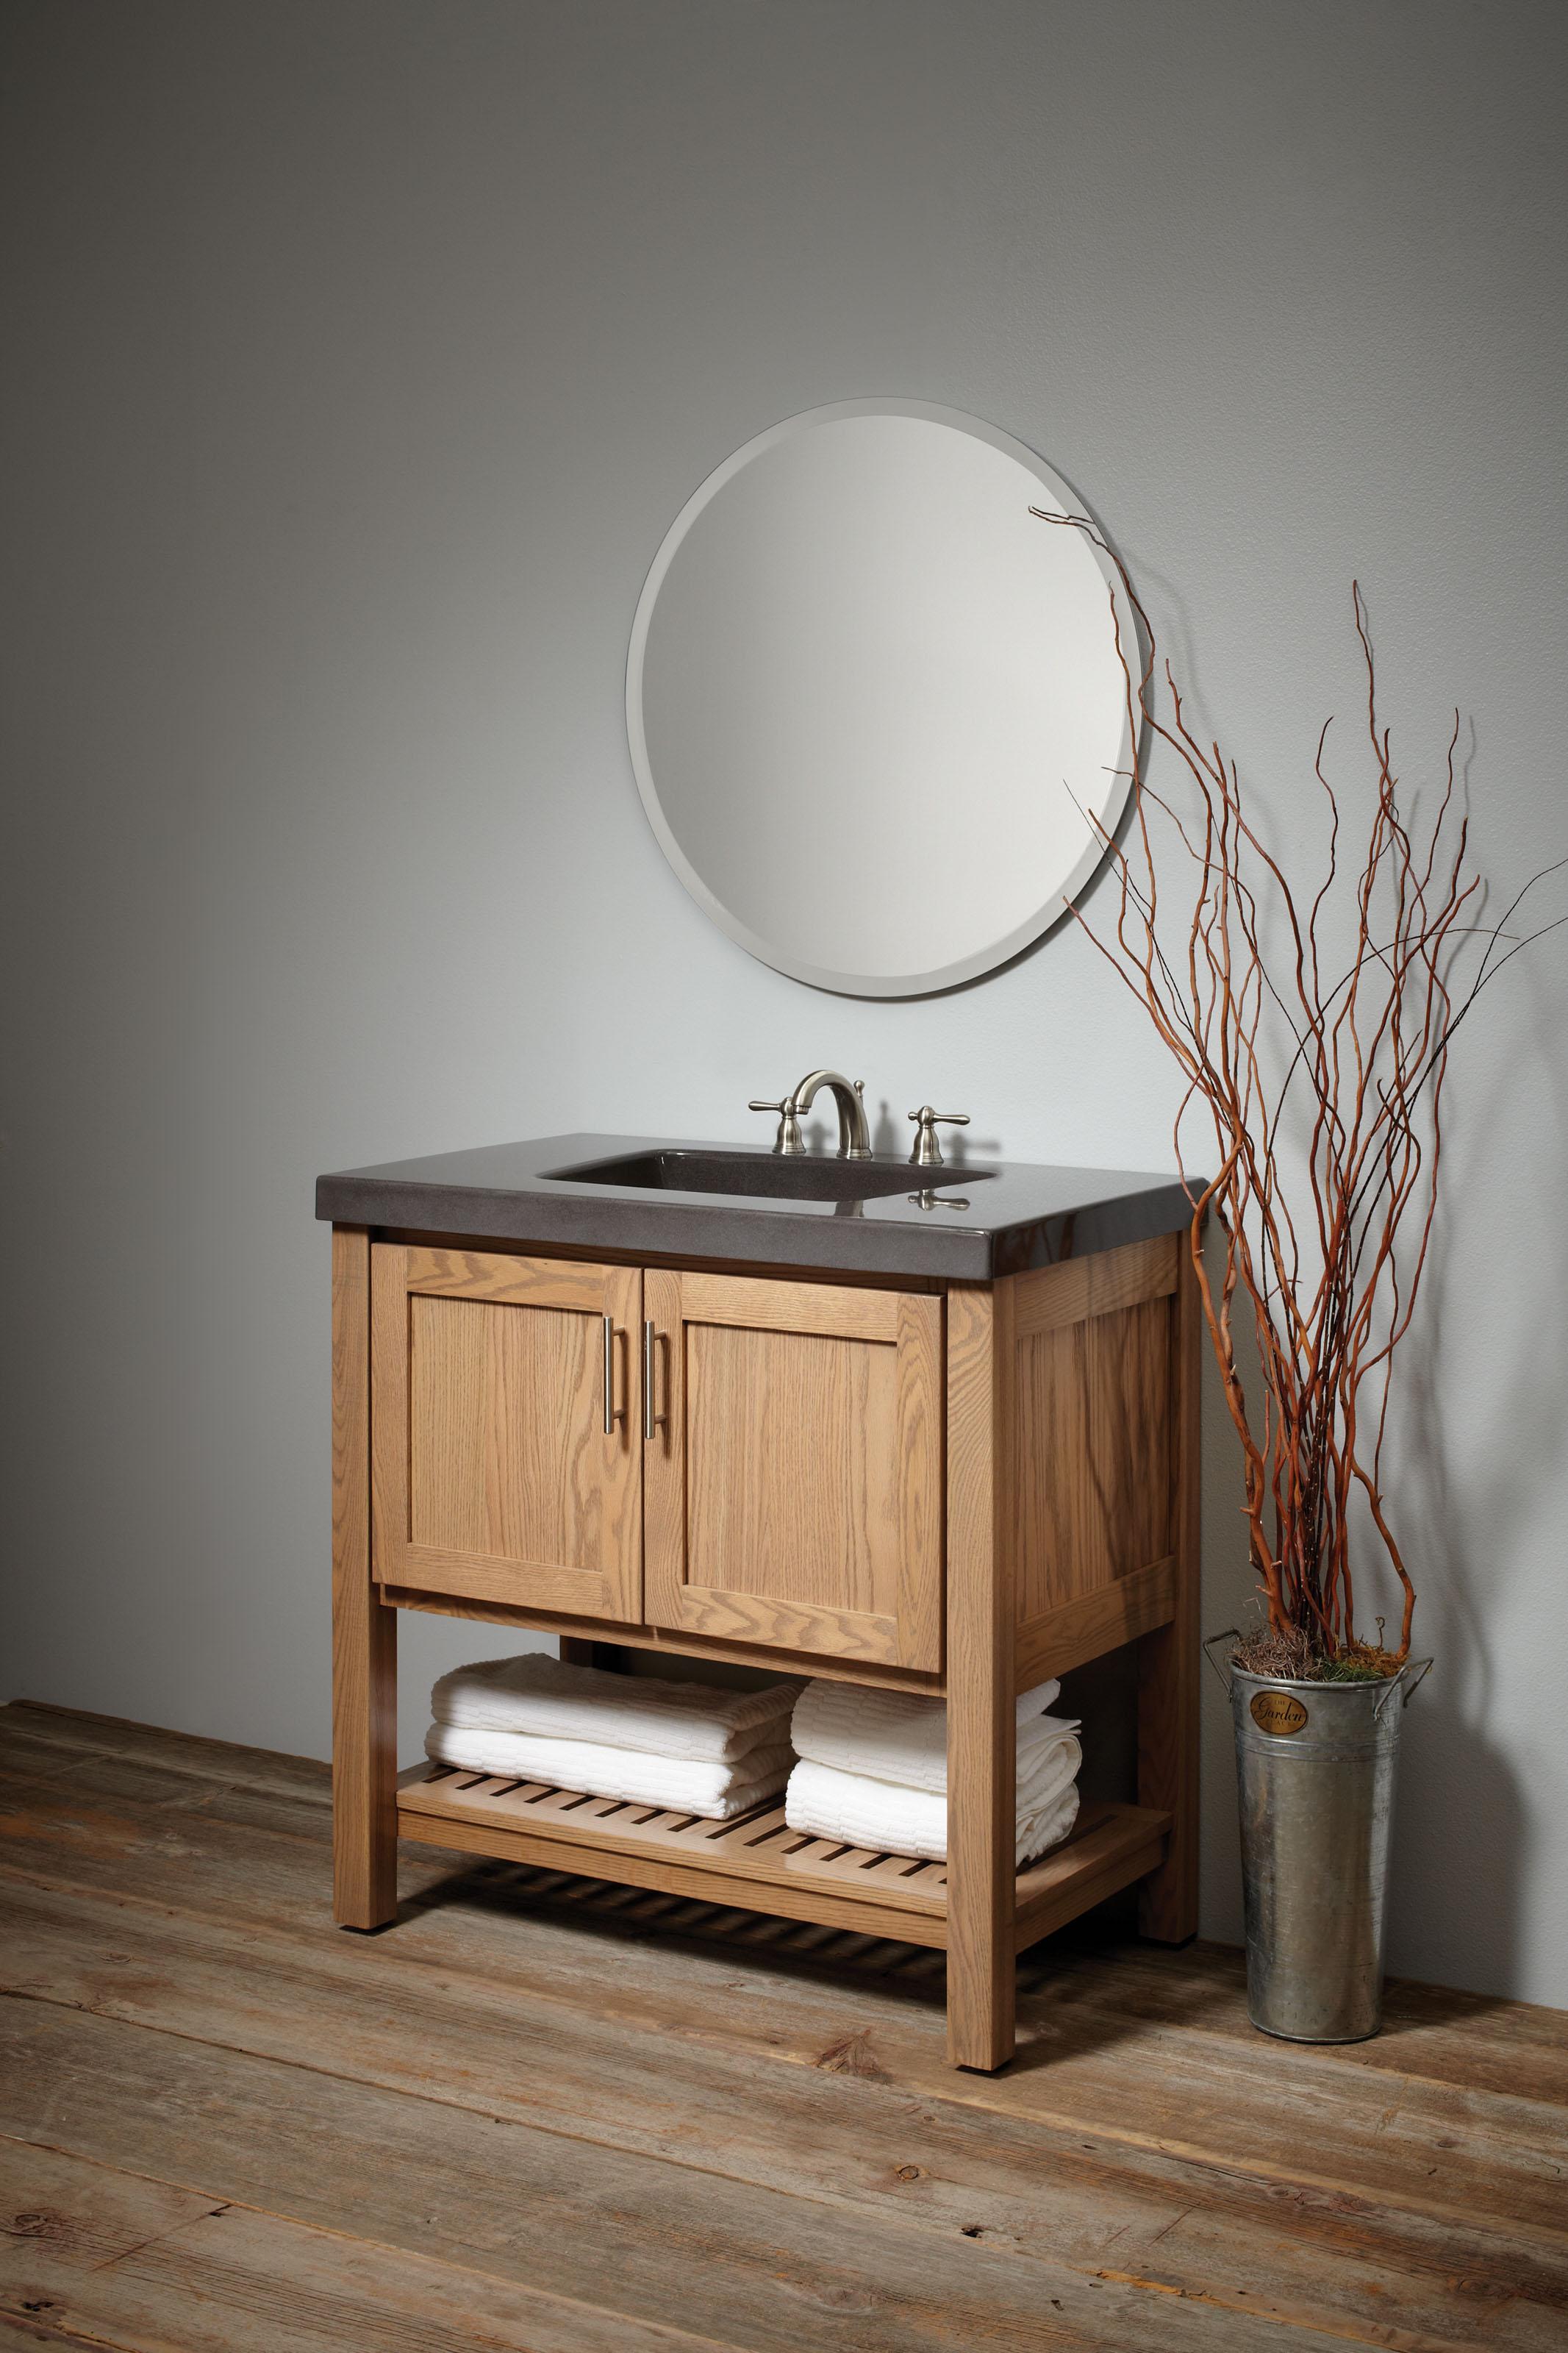 mirror sobb essential osage hardware x bertch brindle size newsize vanity